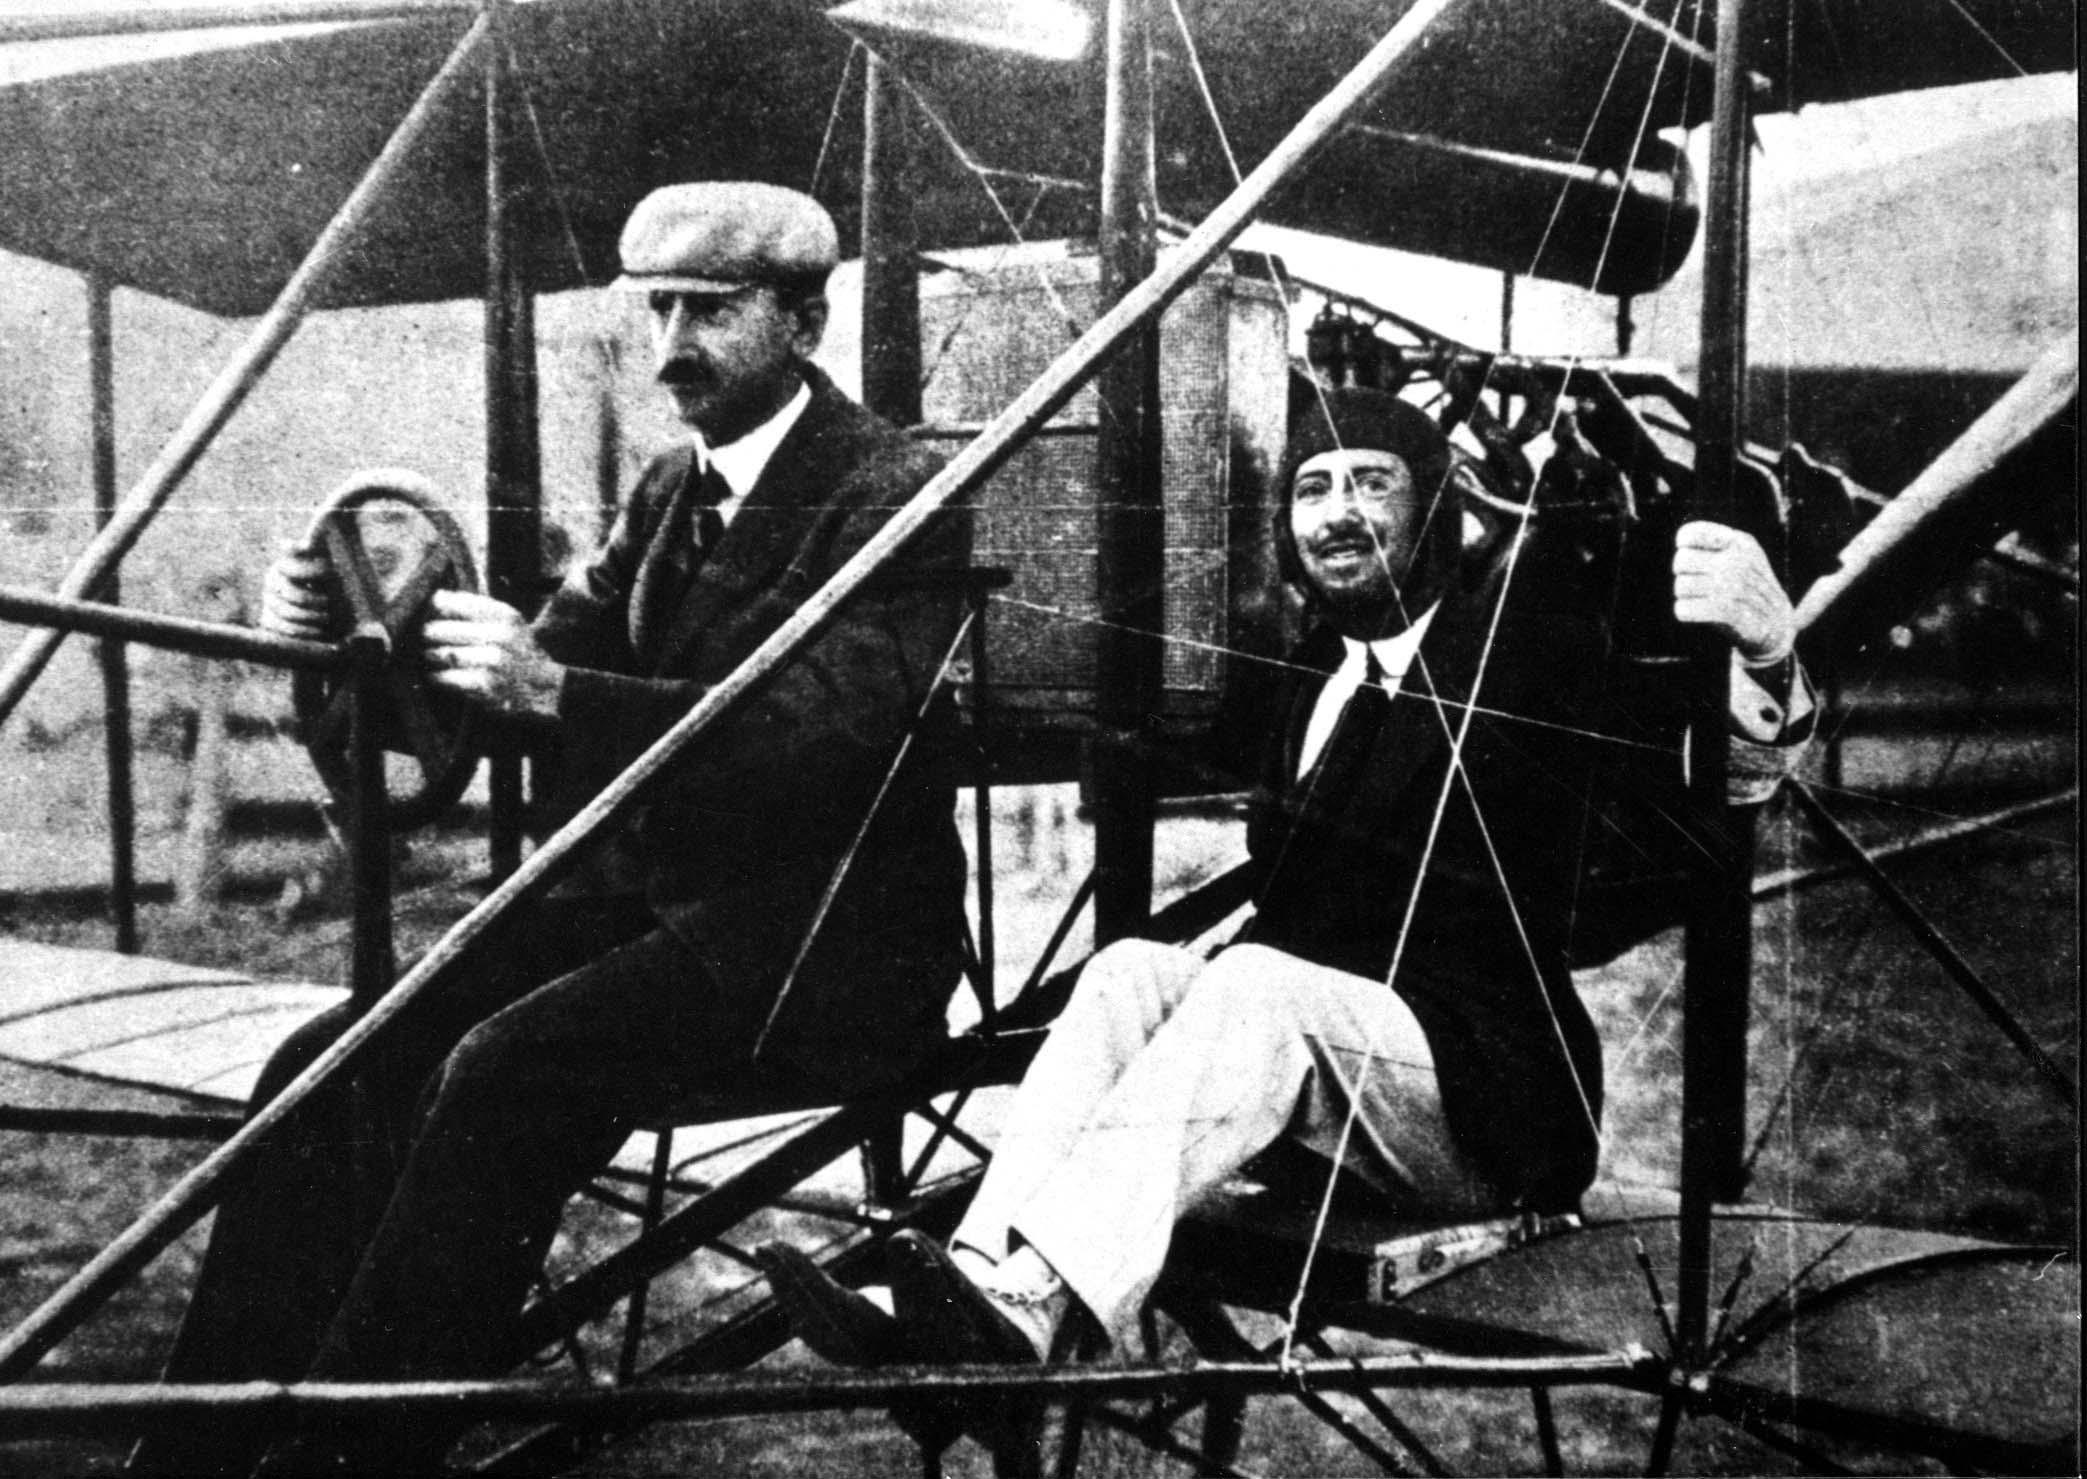 gabriele-dannunzio-aviatore-ilnordest